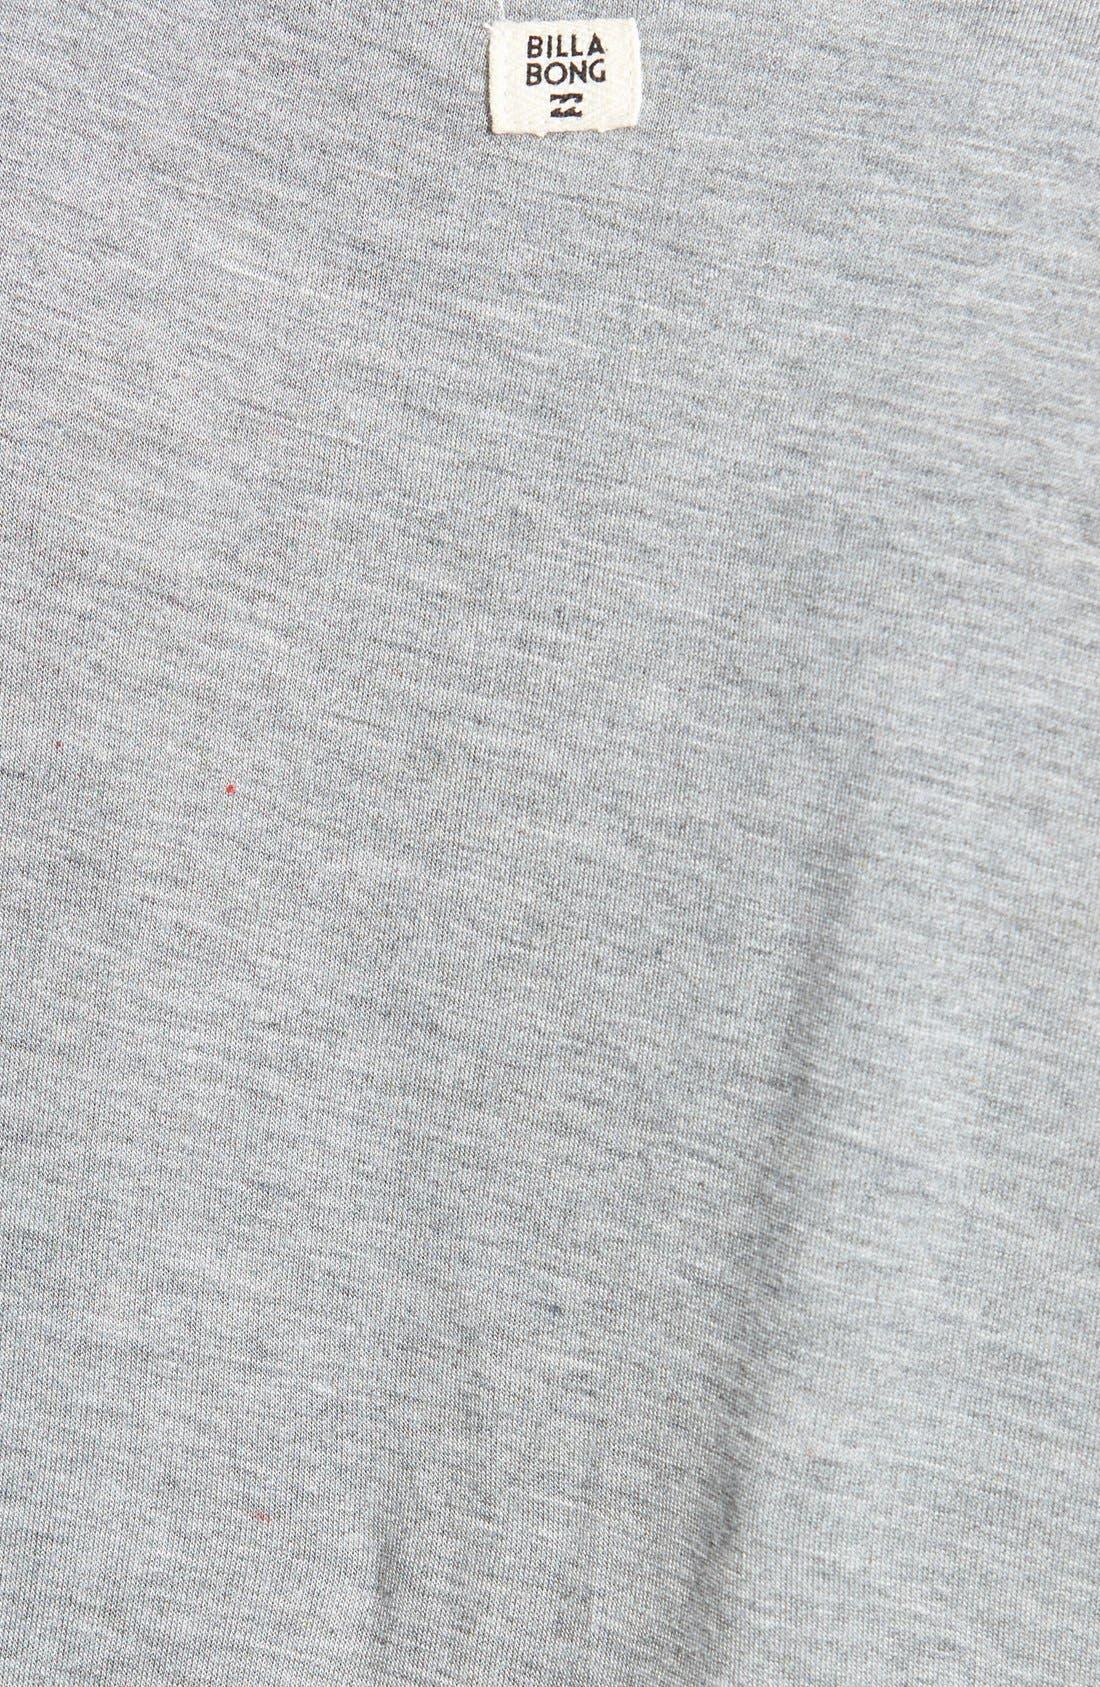 Alternate Image 3  - Billabong 'Last Minute' T-Shirt Dress